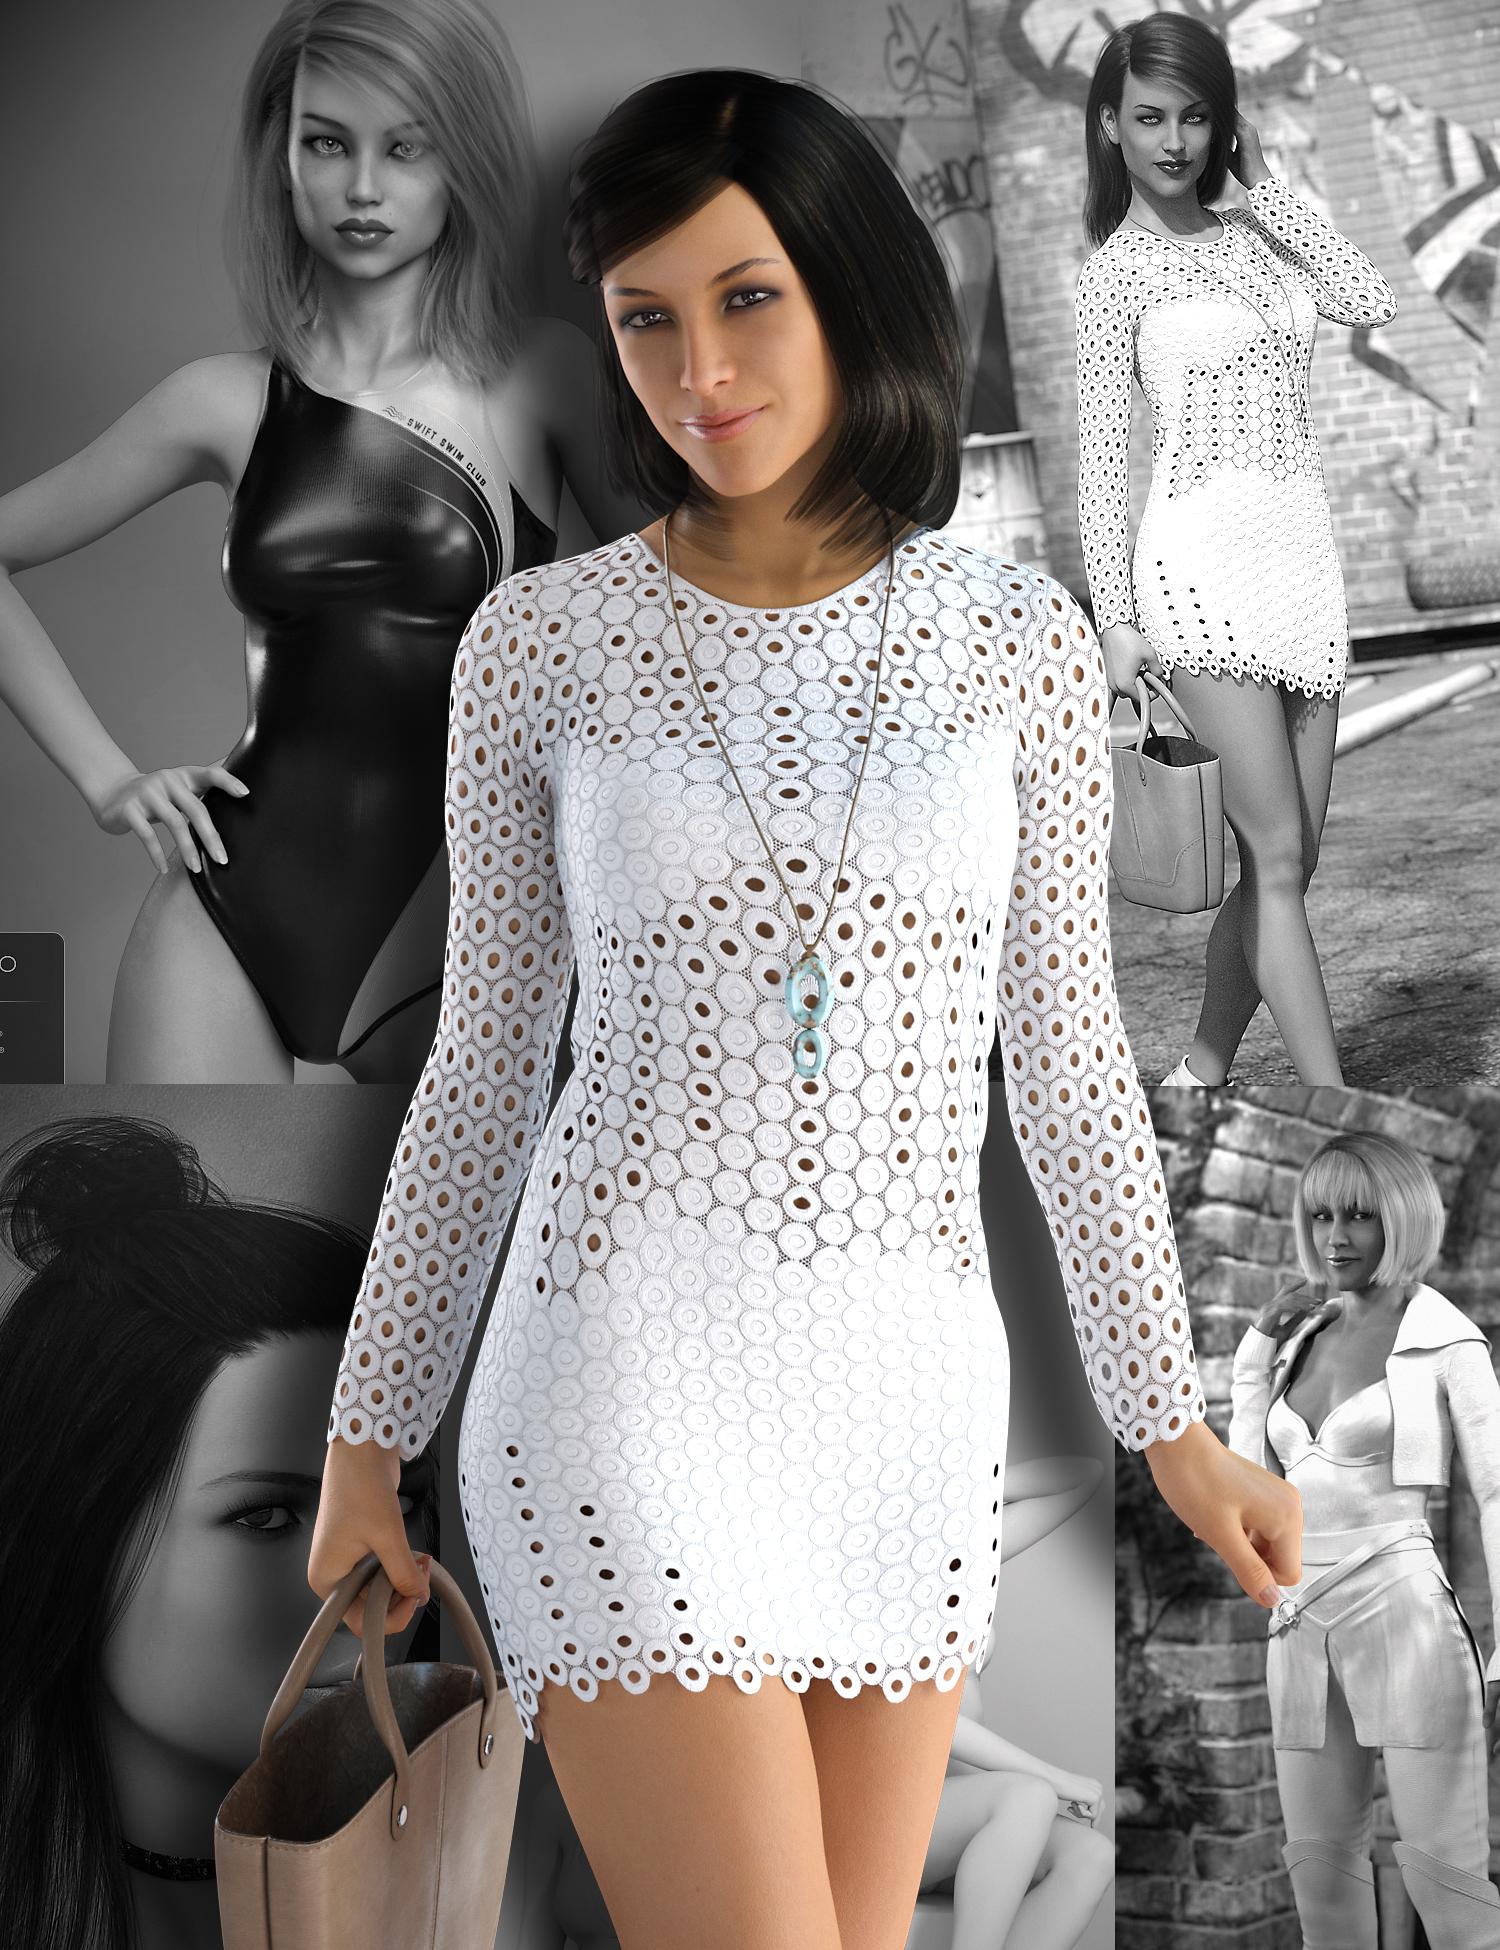 Stephanie 8 Starter Bundle by: , 3D Models by Daz 3D